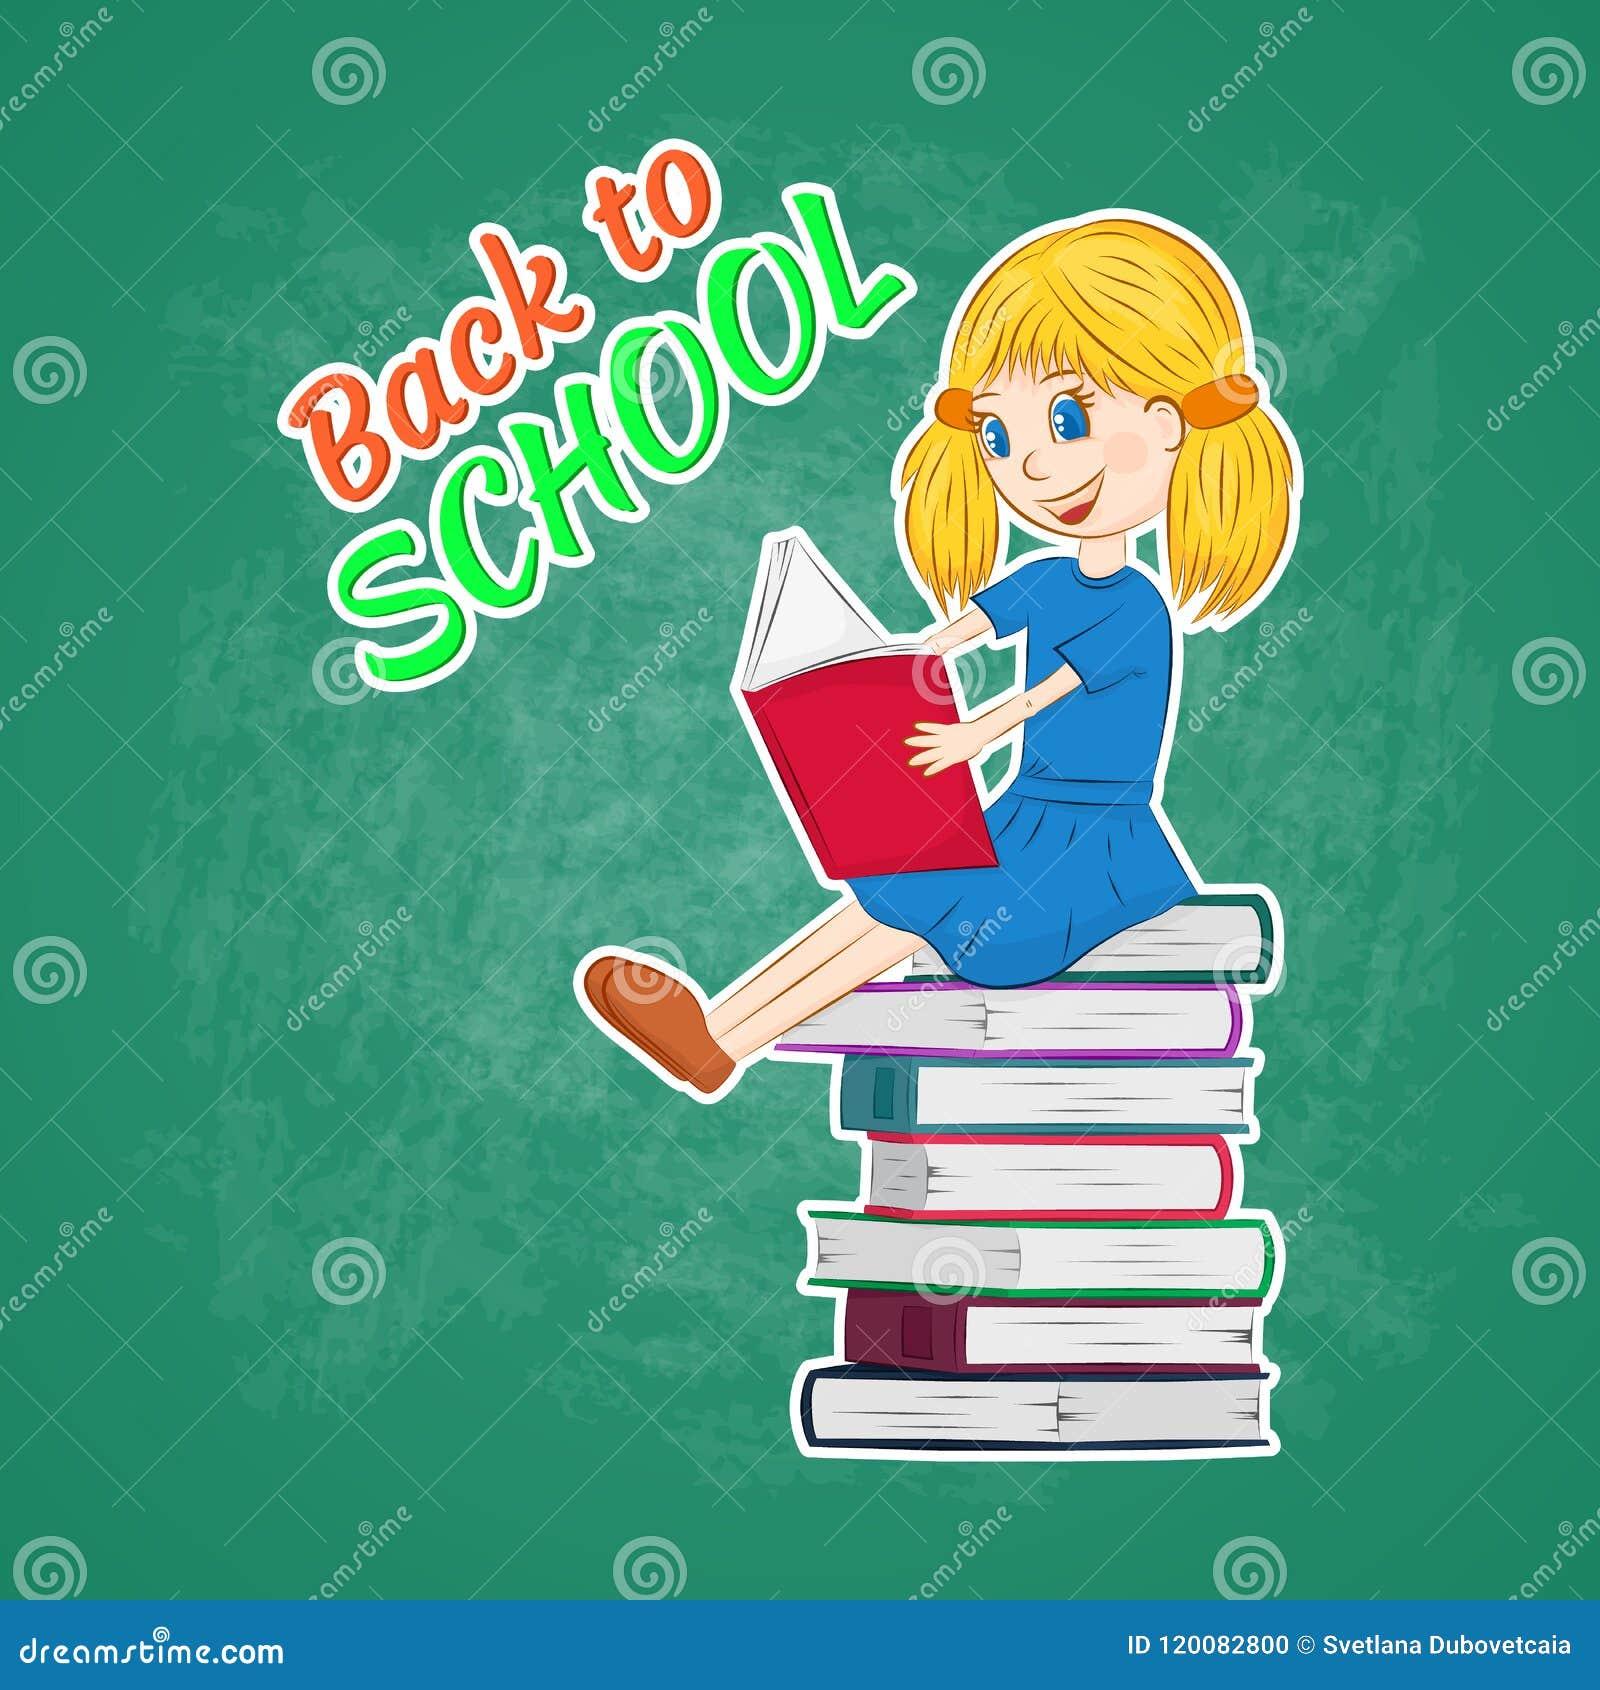 back to school, little girl studying